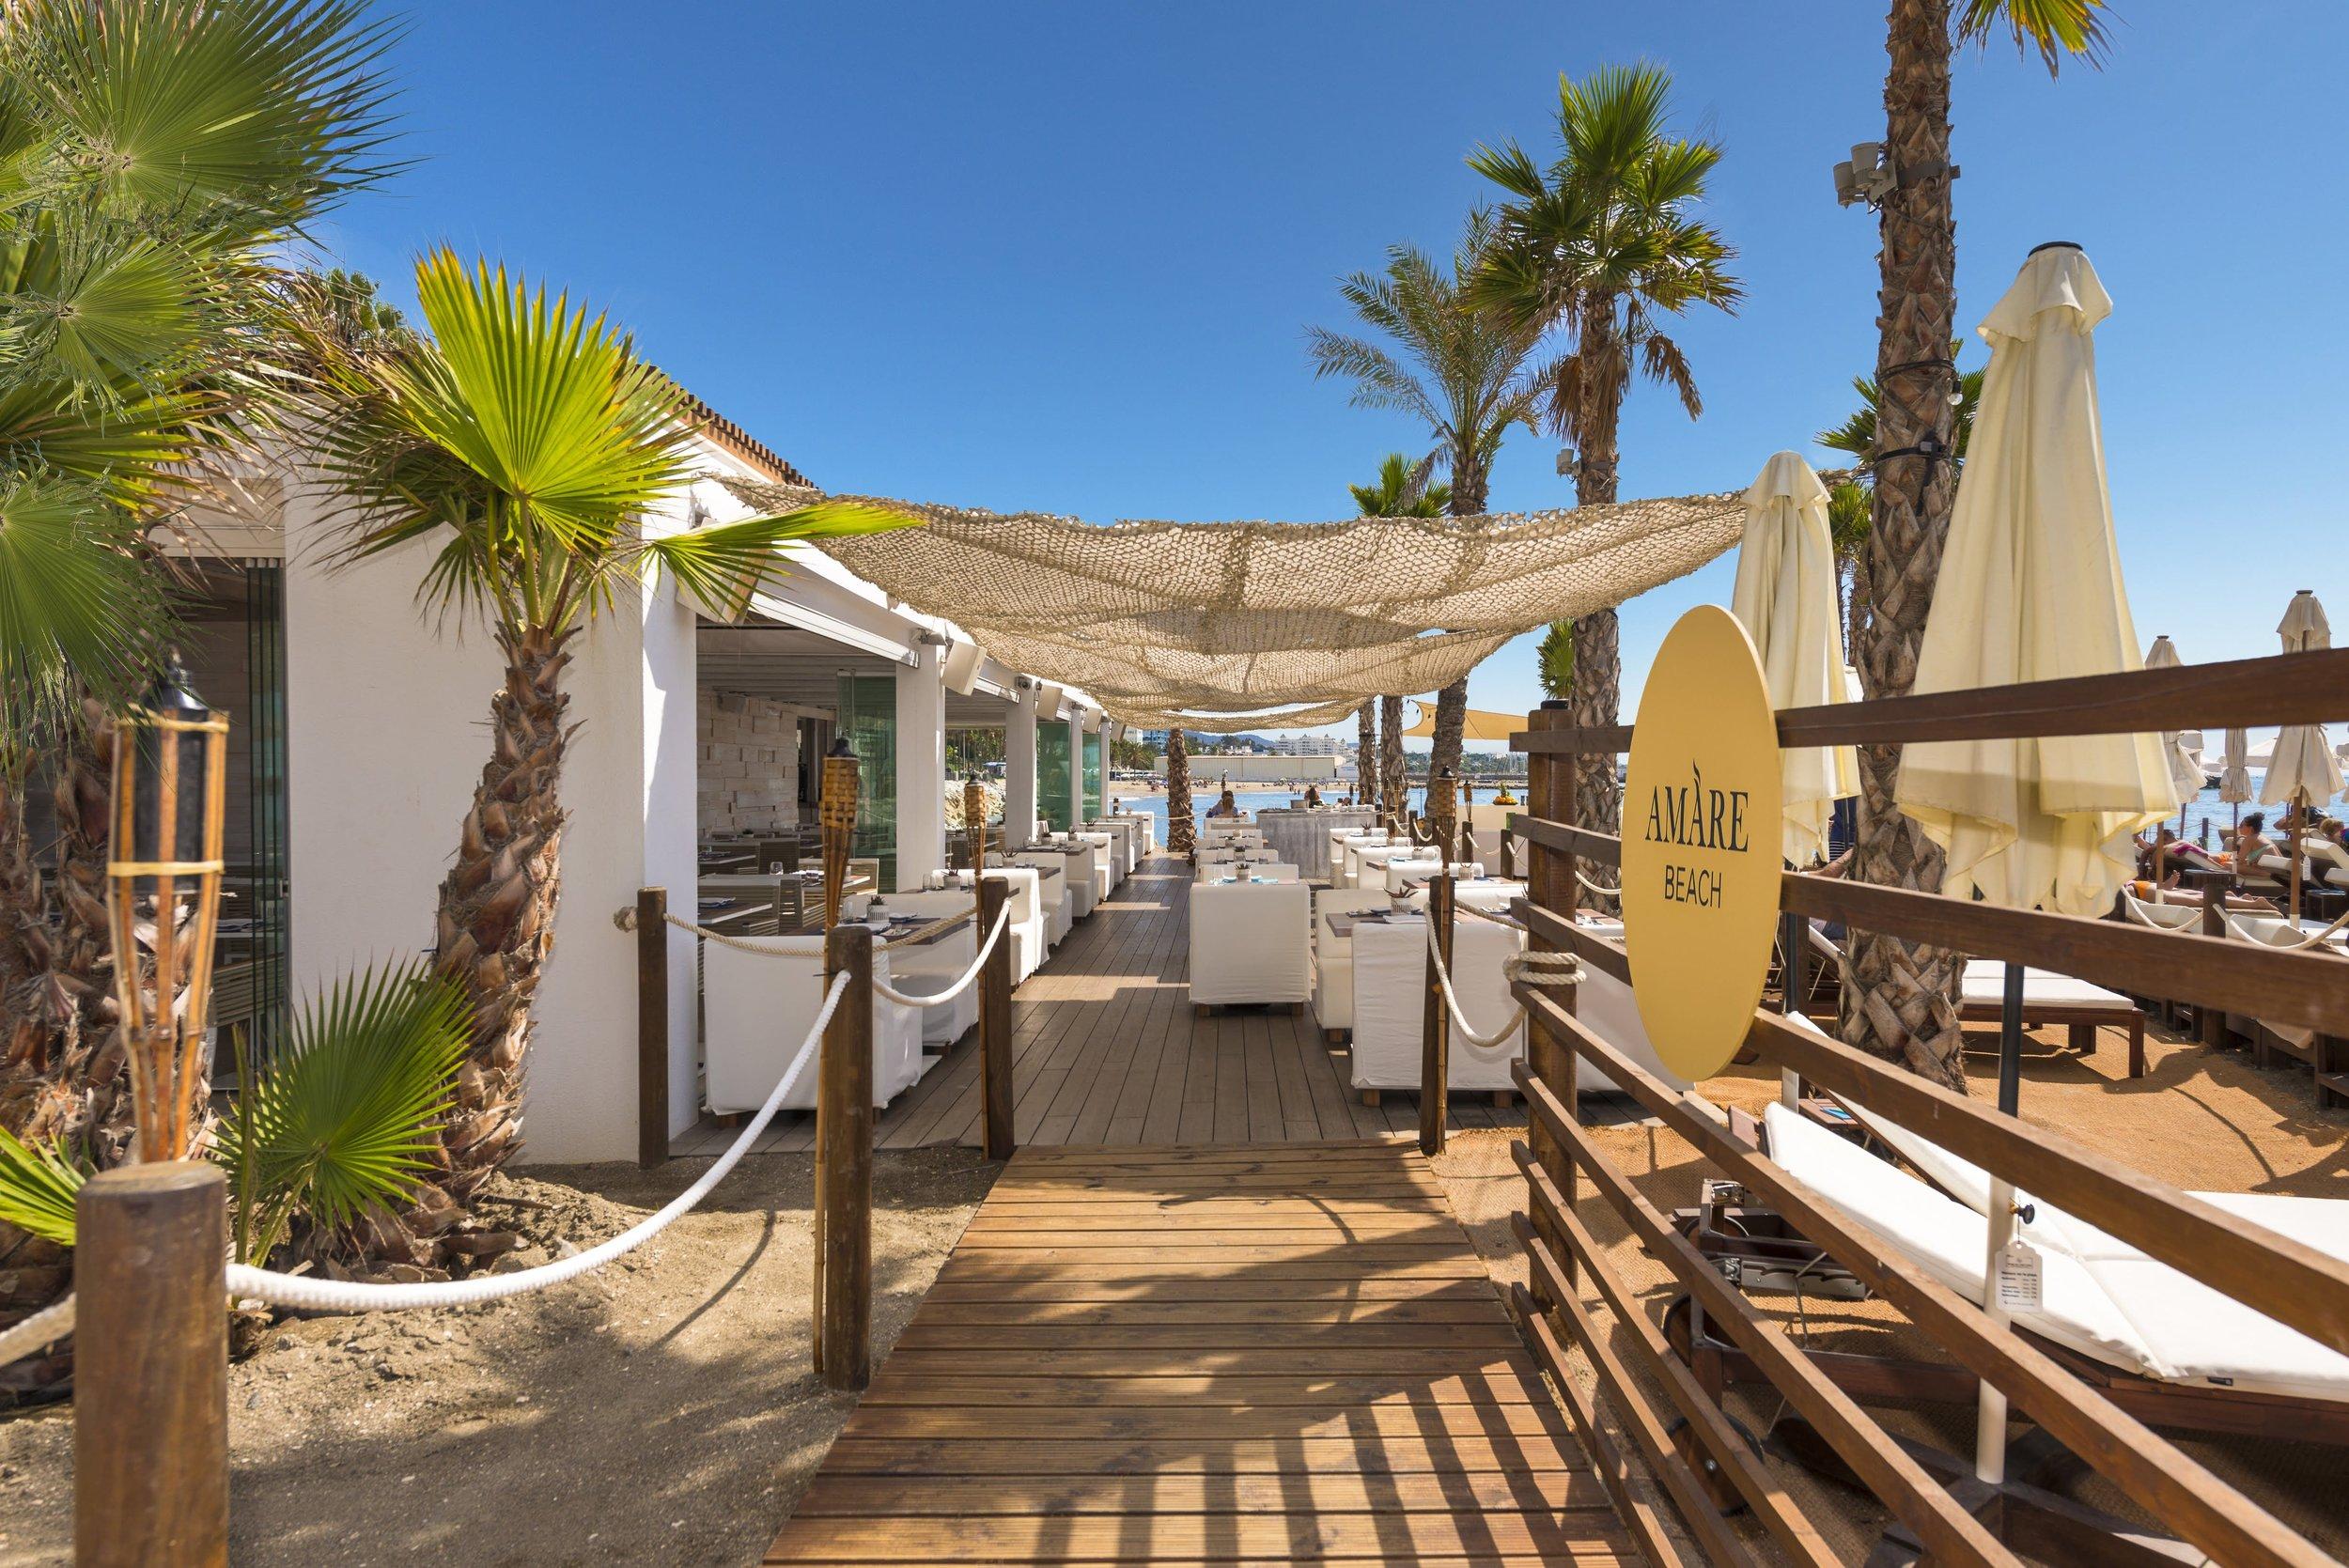 Amare Beach Hotel Marbella Beach Club